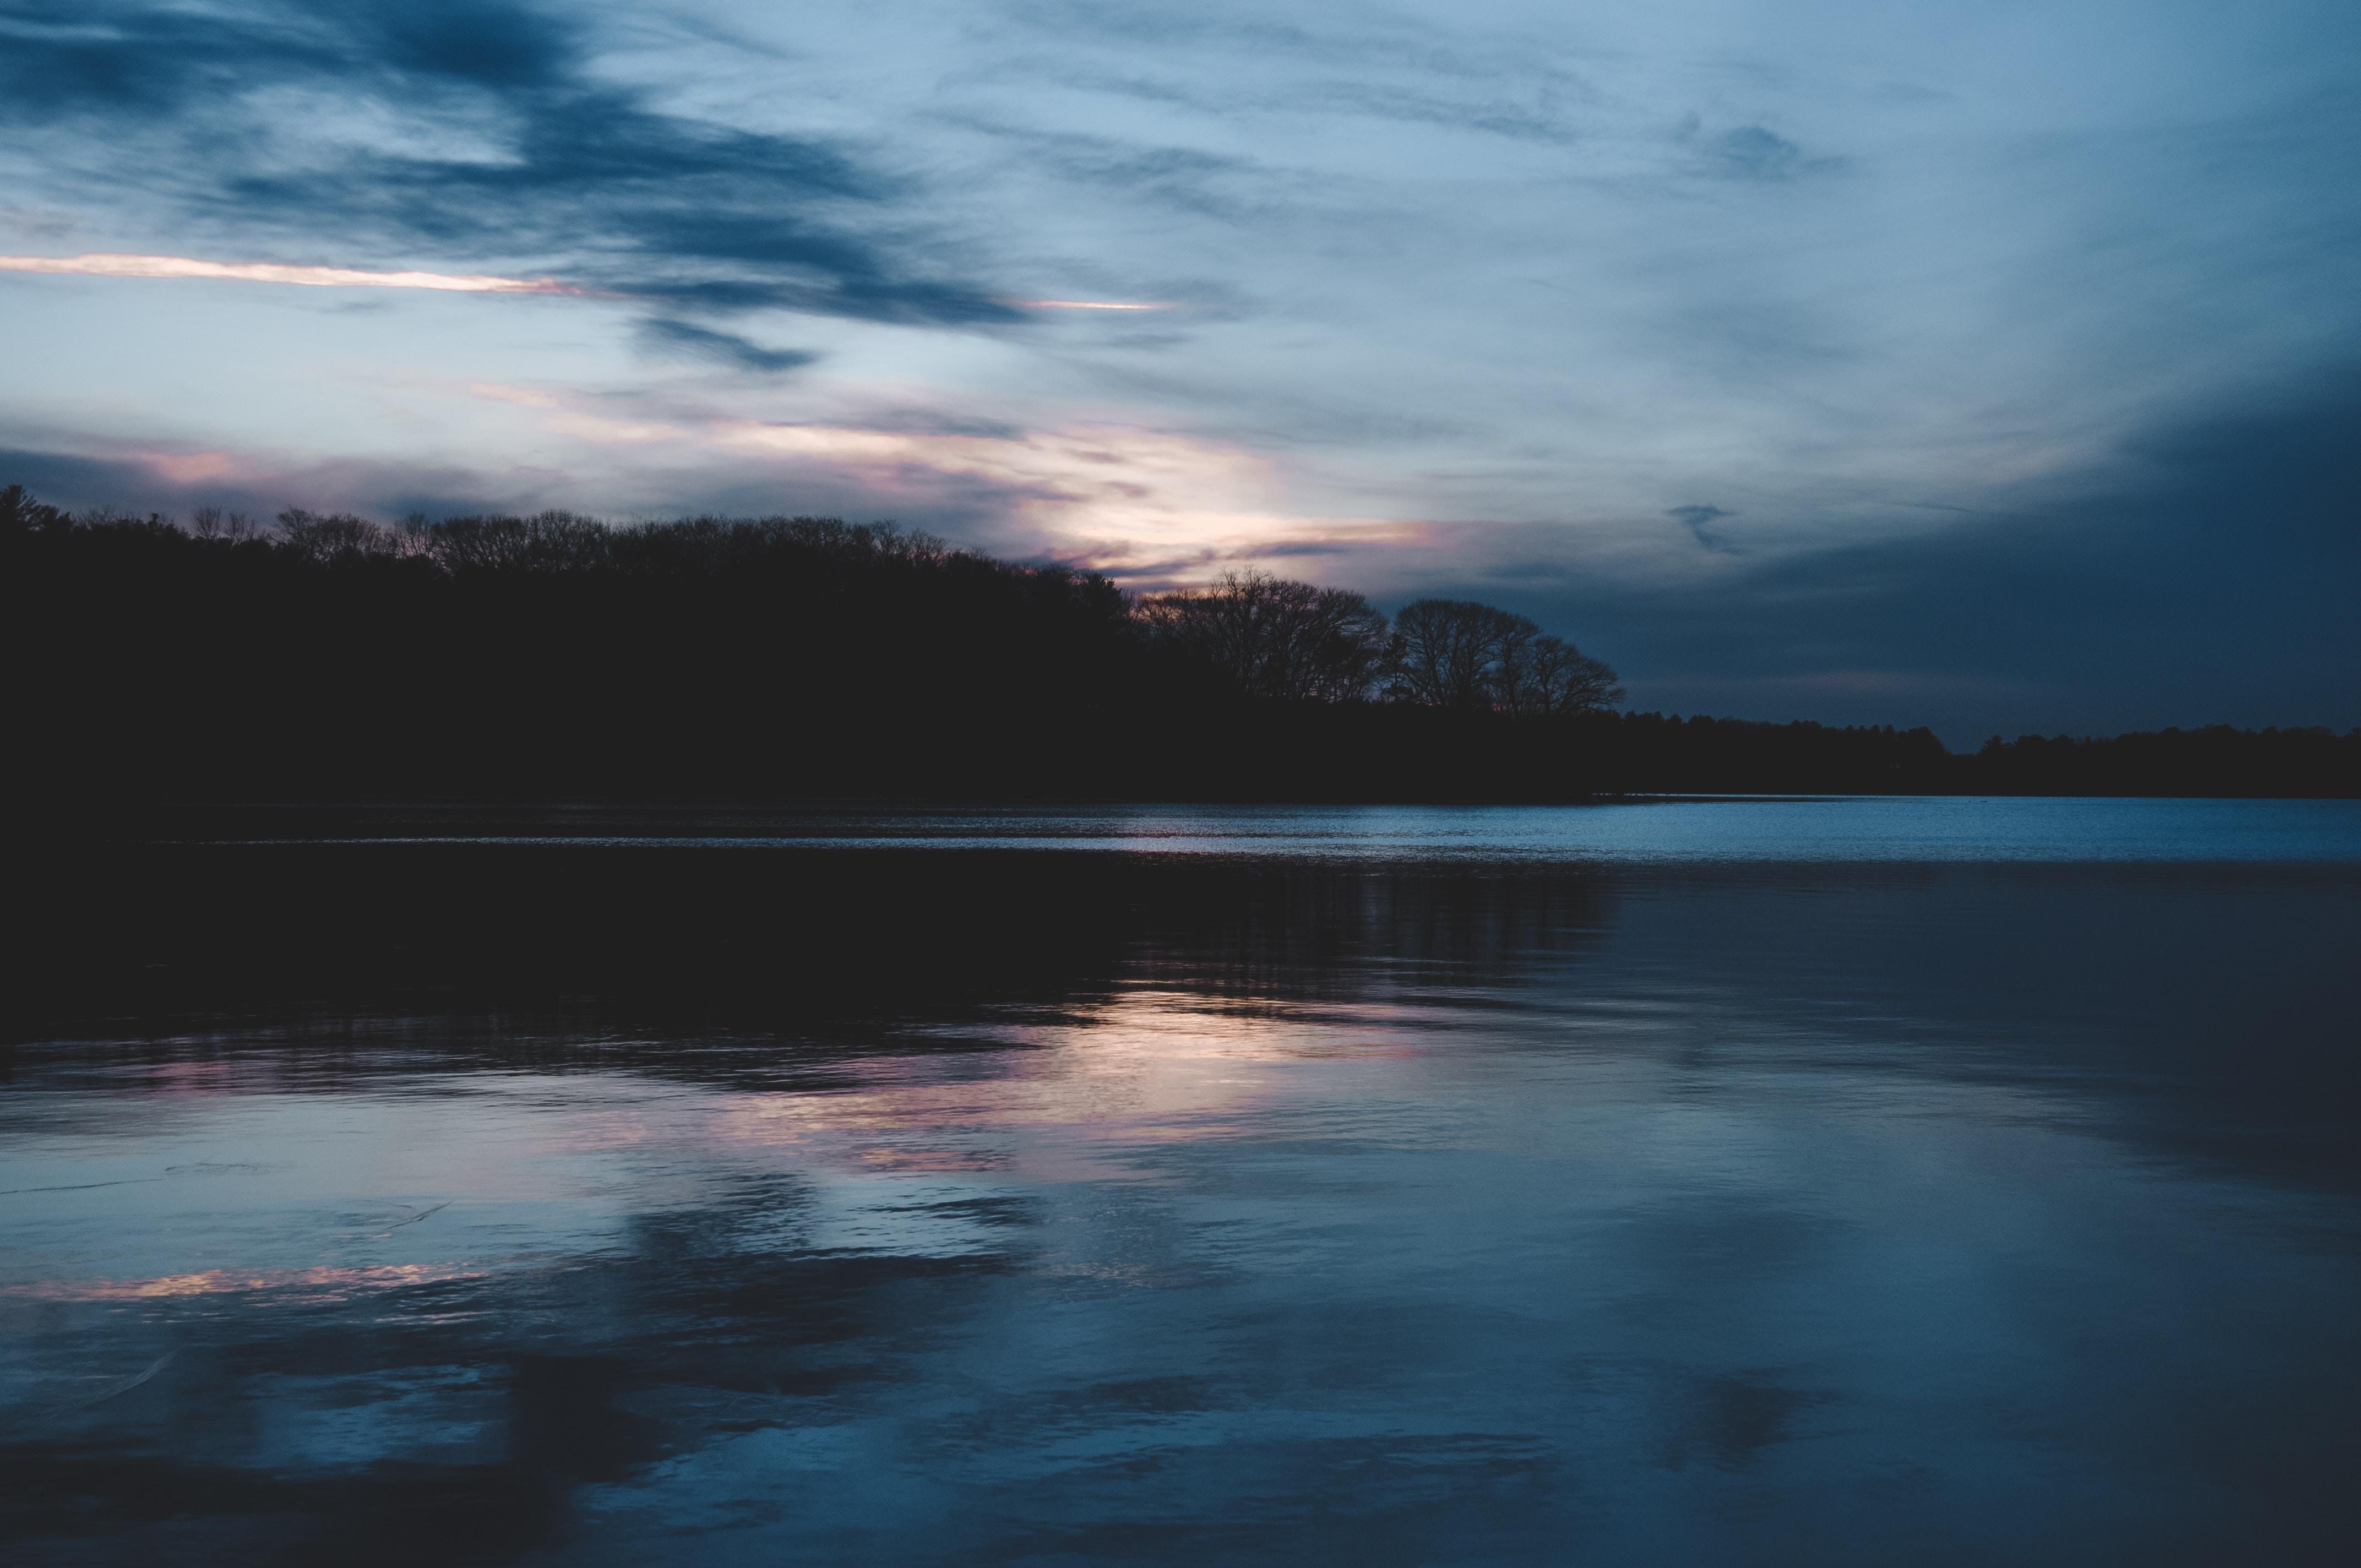 98313 Заставки и Обои Озеро на телефон. Скачать Вечер, Озеро, Горизонт, Природа, Облака картинки бесплатно